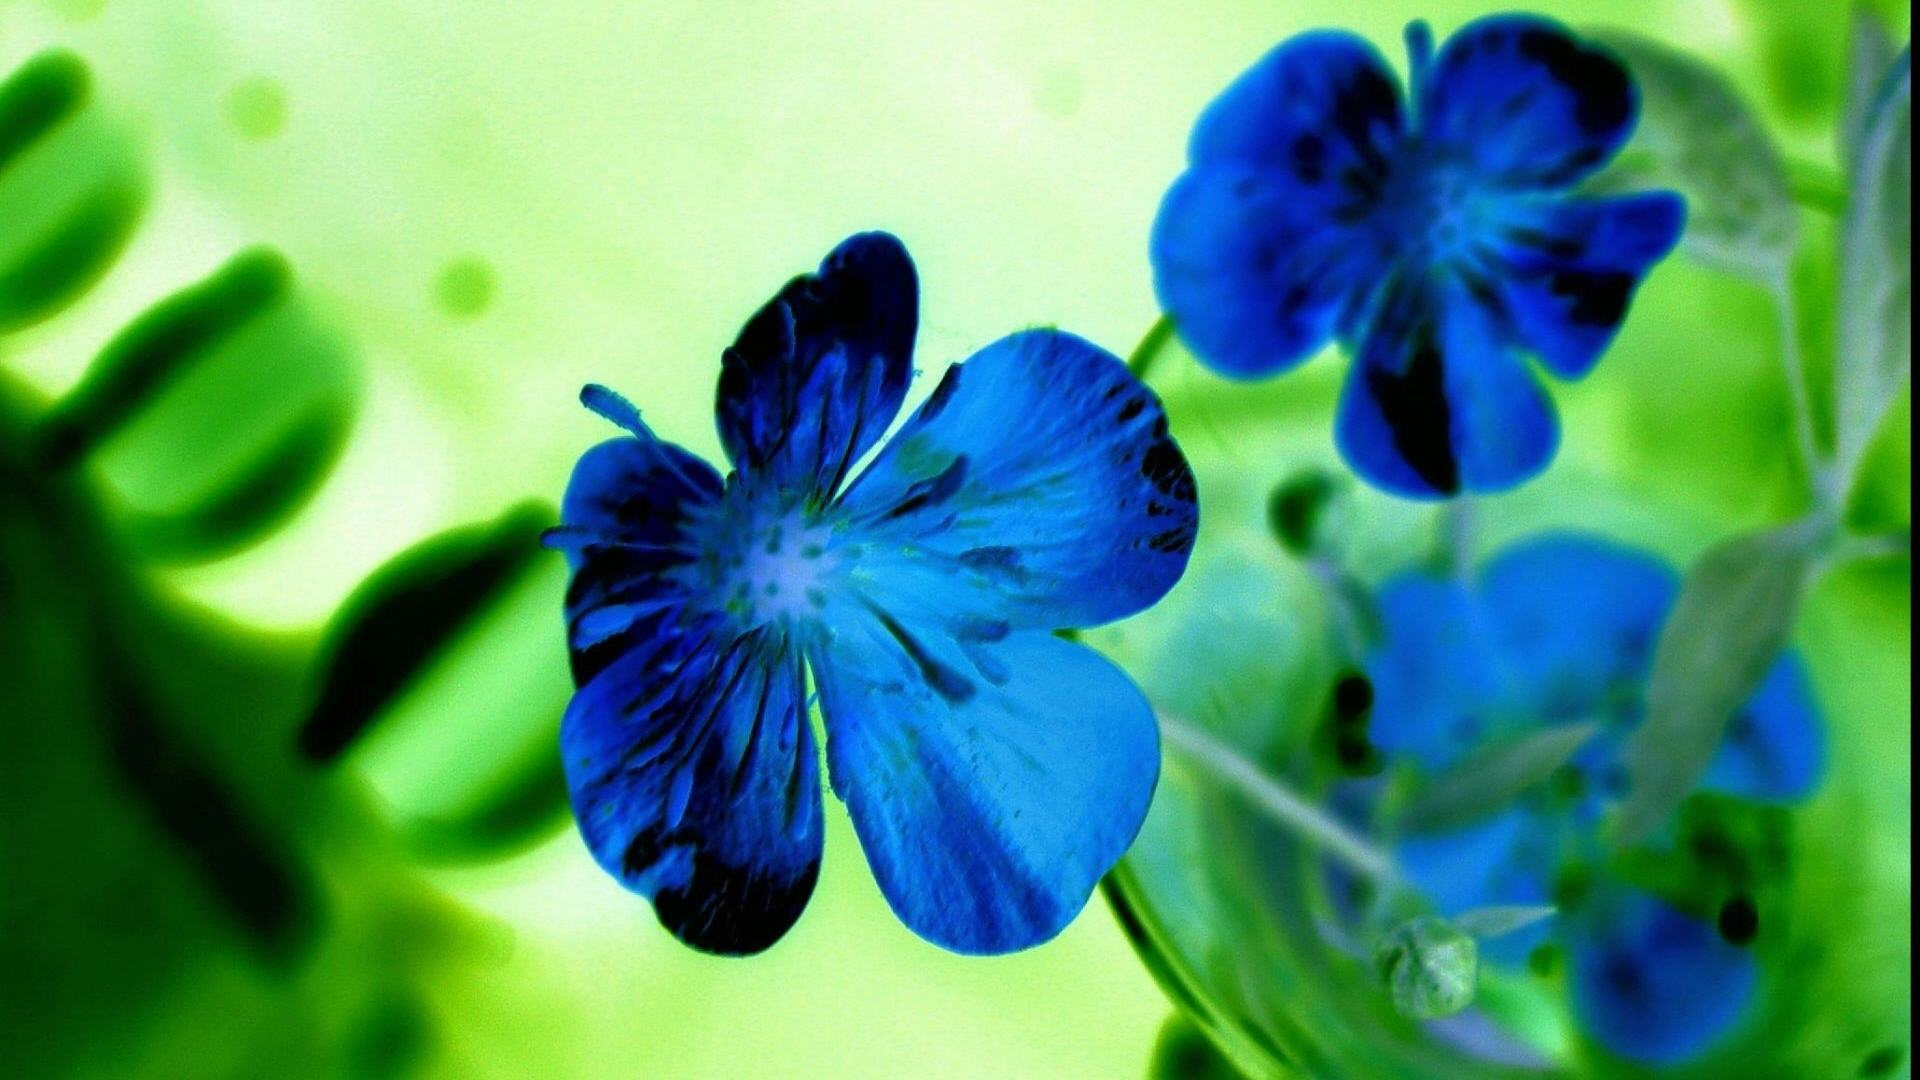 Free Download Beautiful Blue Flowers Hd Desktop Wallpaper Hd Desktop Wallpaper 1920x1080 For Your Desktop Mobile Tablet Explore 68 Hd Flowers Wallpaper Free Flower Wallpaper And Screensavers Pink Flower